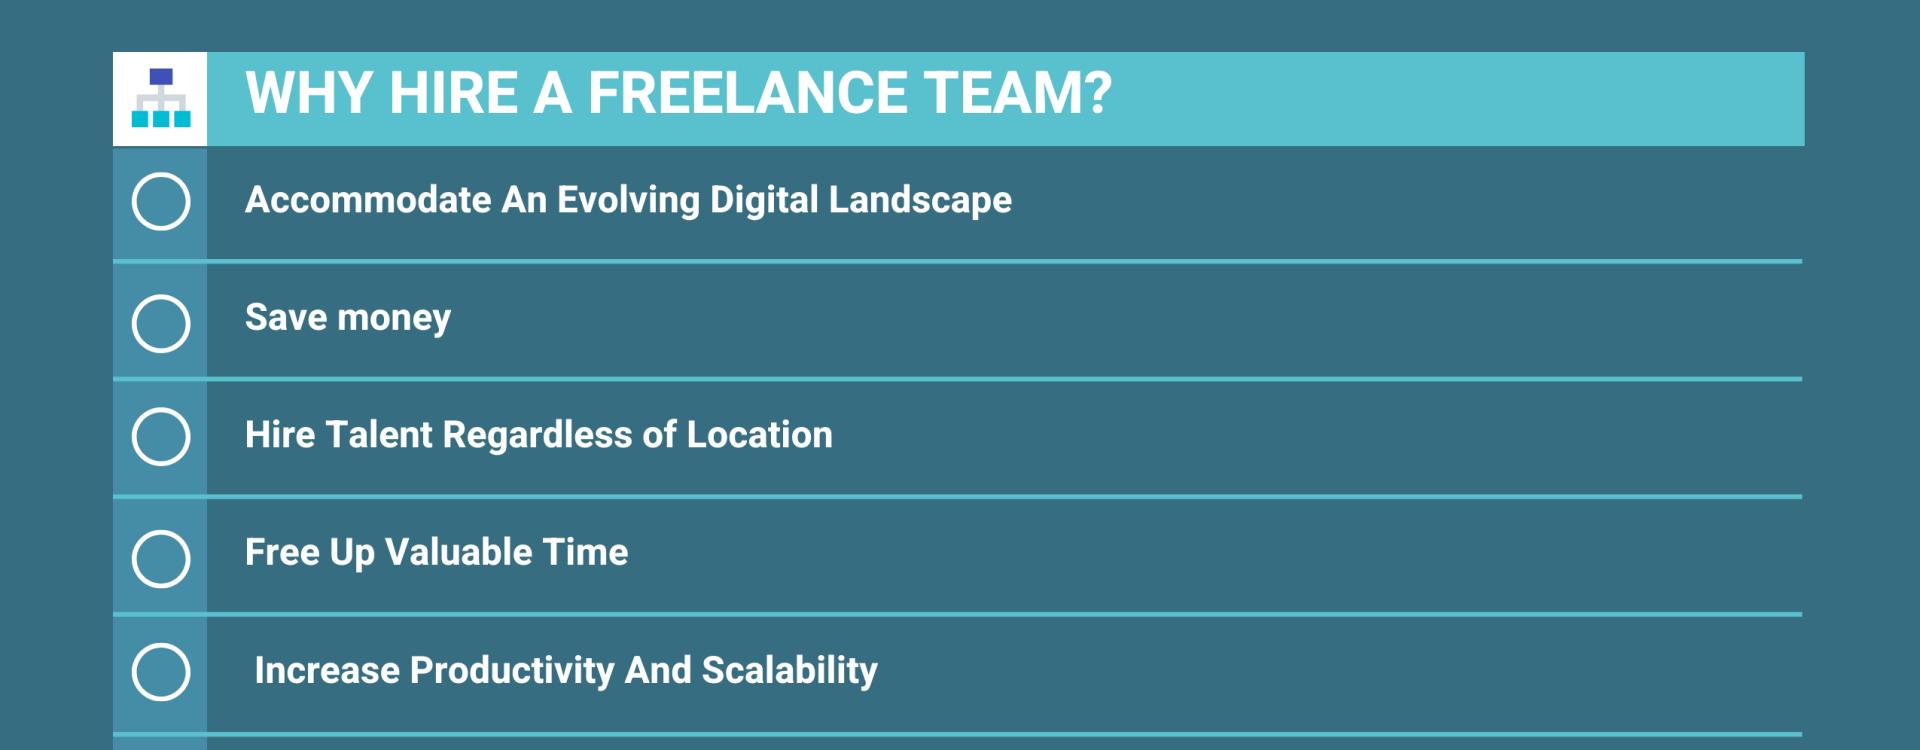 why hire a freelance team